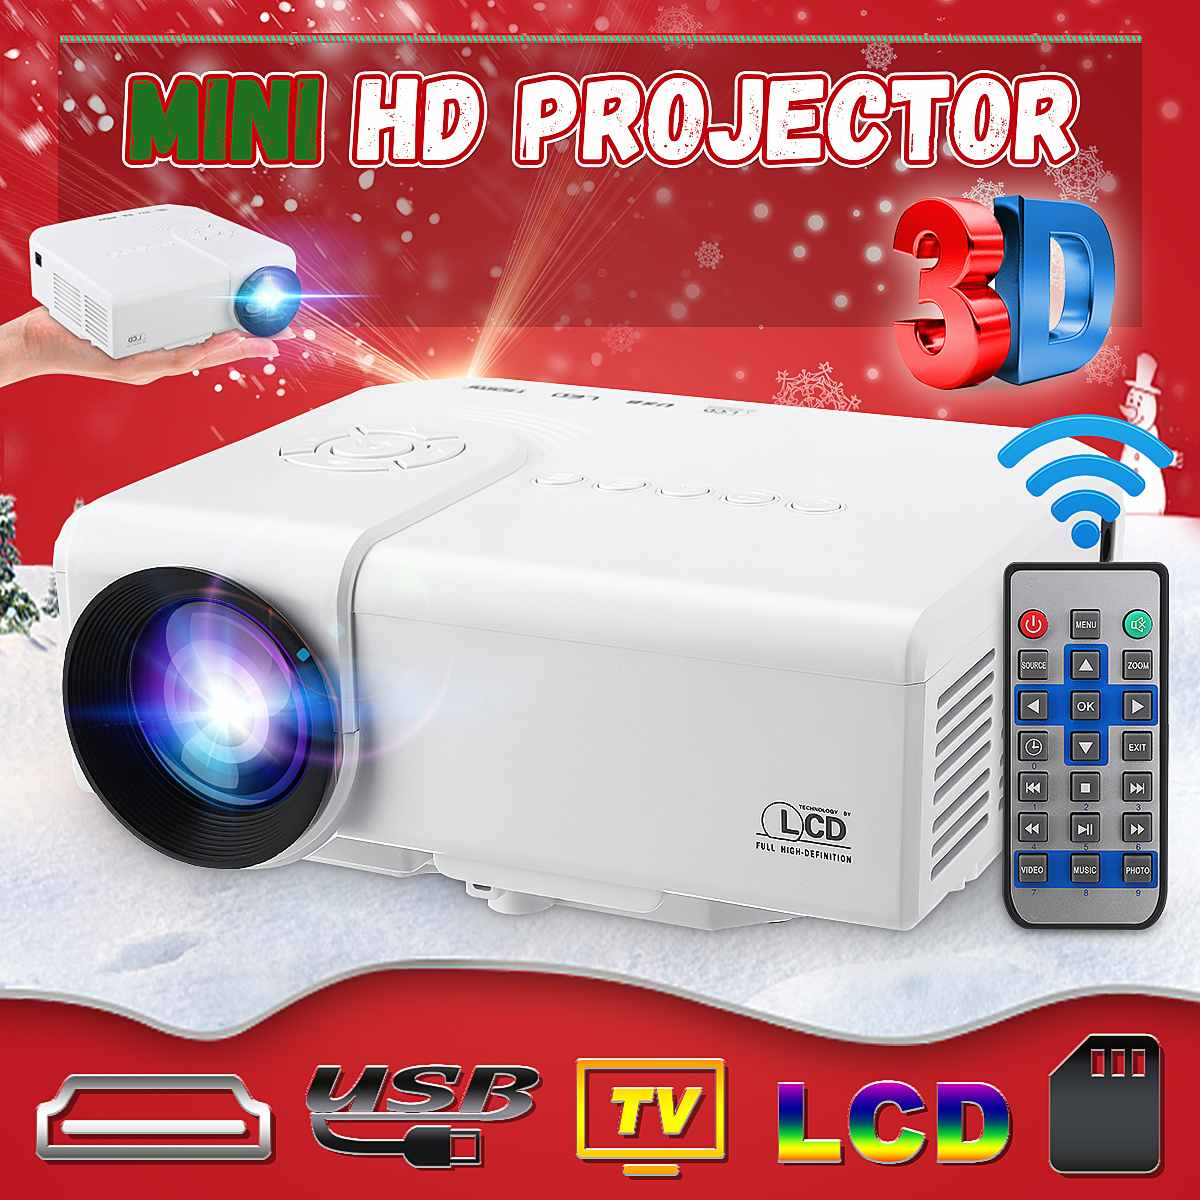 HD Mini Proyector portátil nativa de 480x320P Proyector wi-fi LED Video casa cine 3D HDMI juego de la película Proyector